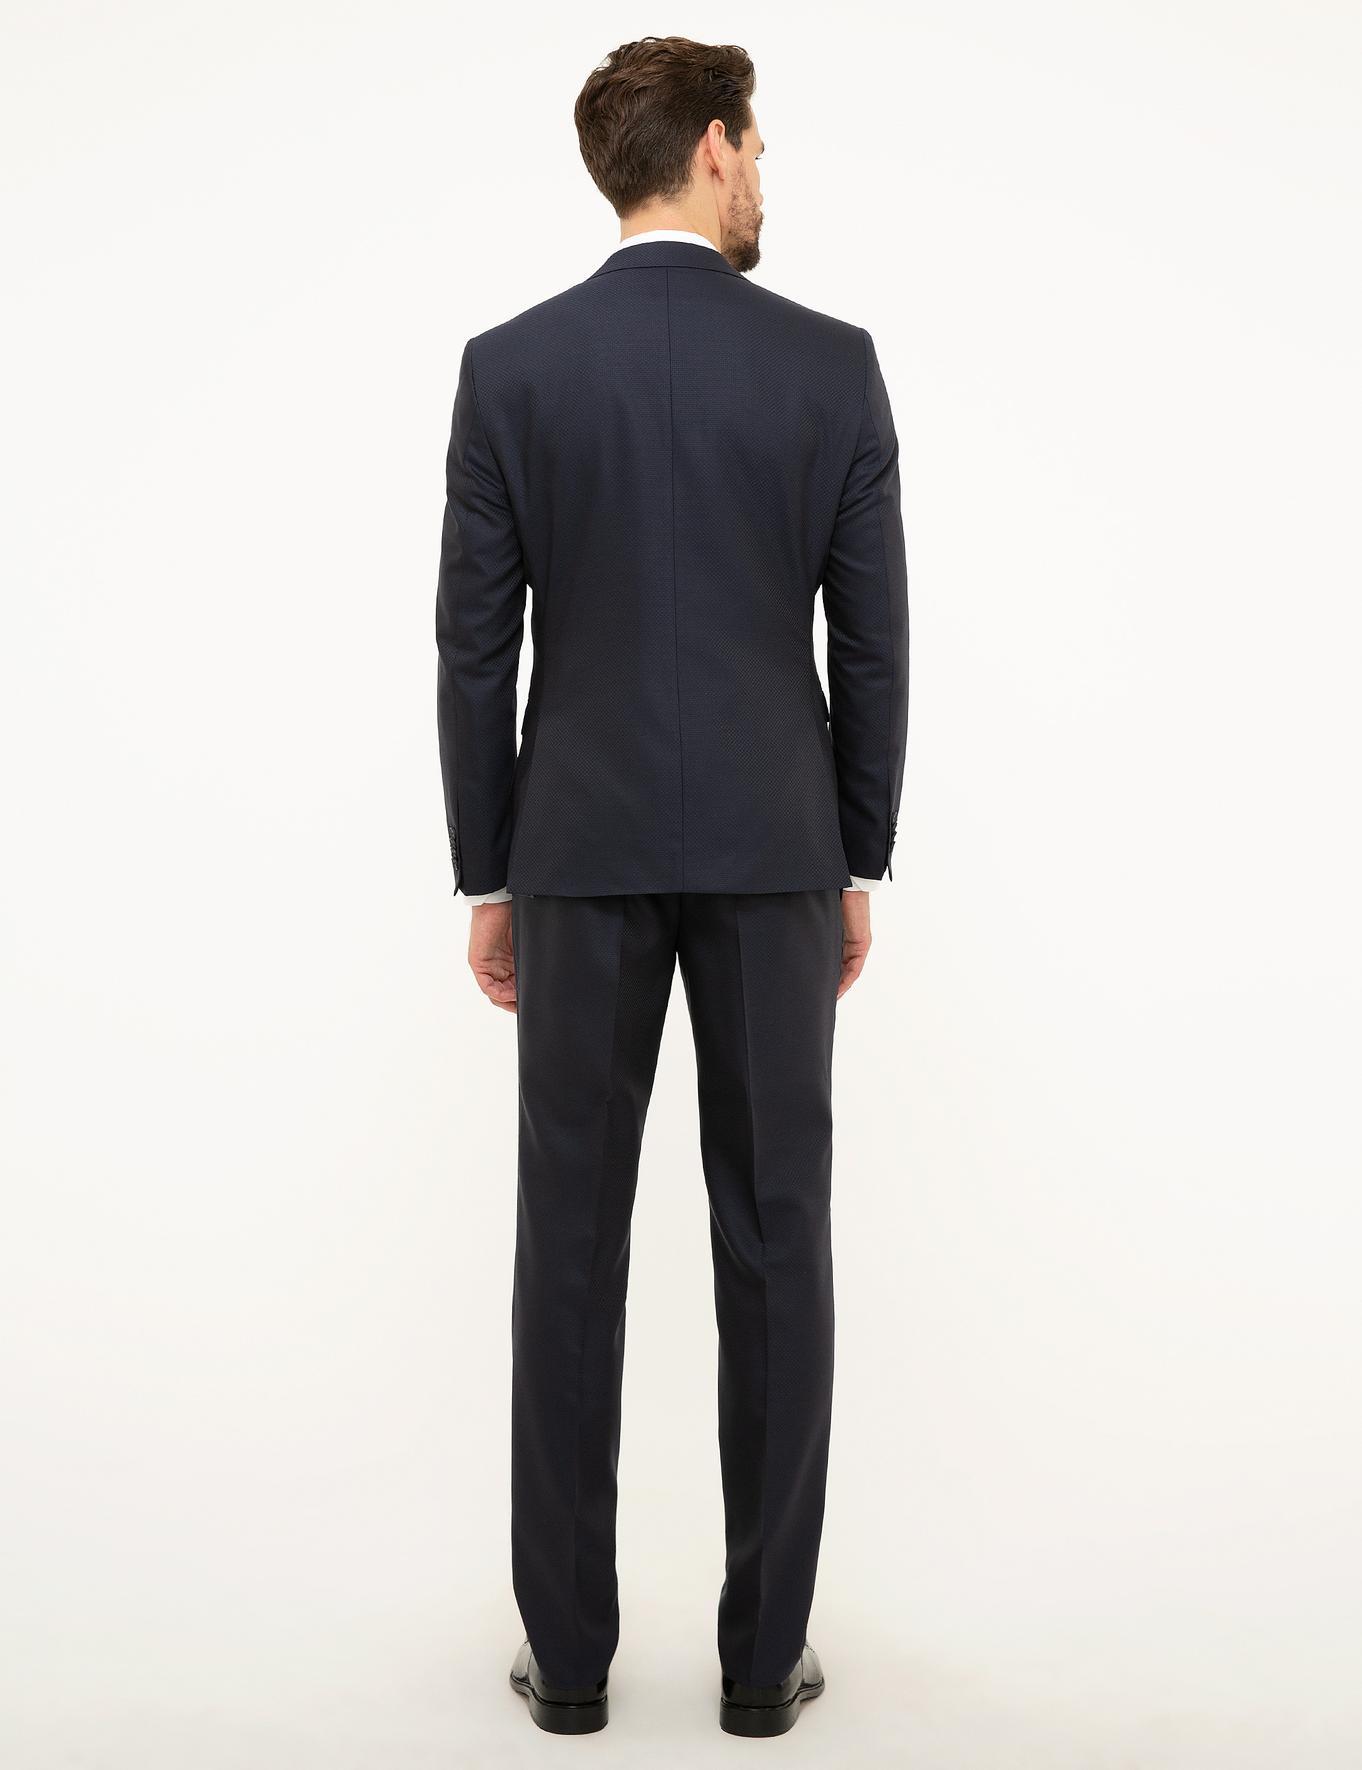 Lacivert Takım Elbise